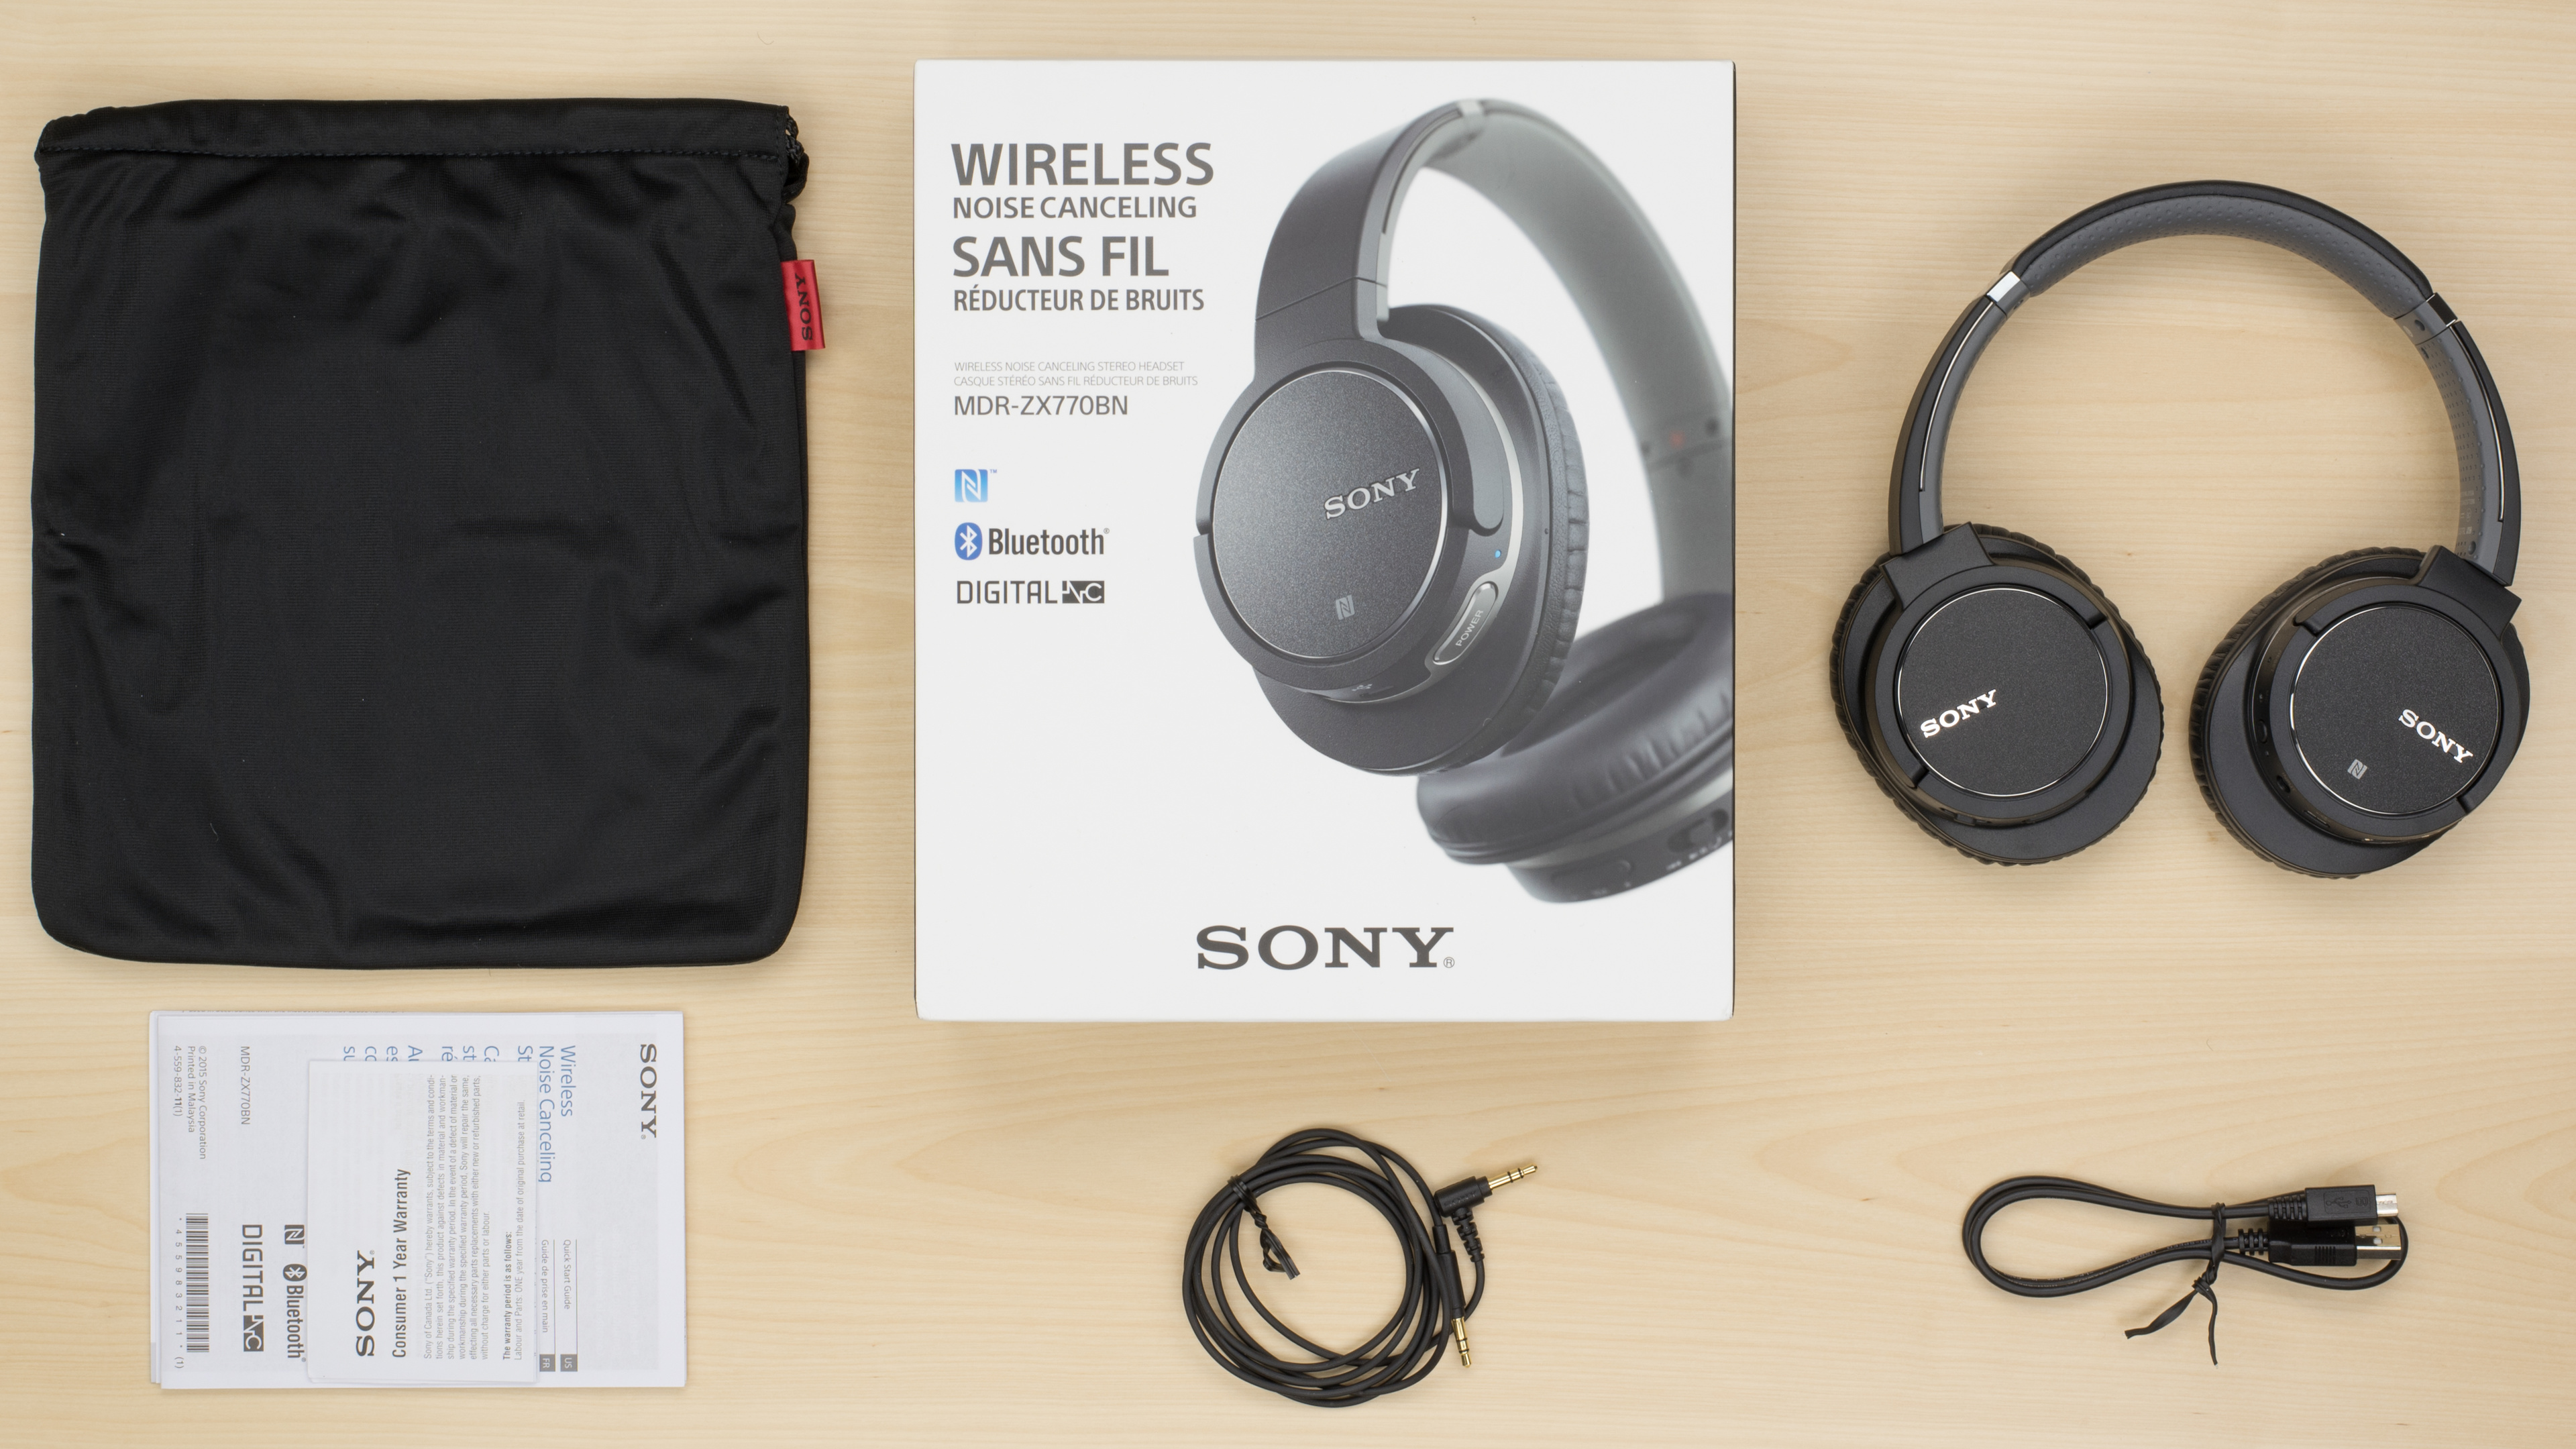 Sony mdr-zx770bt